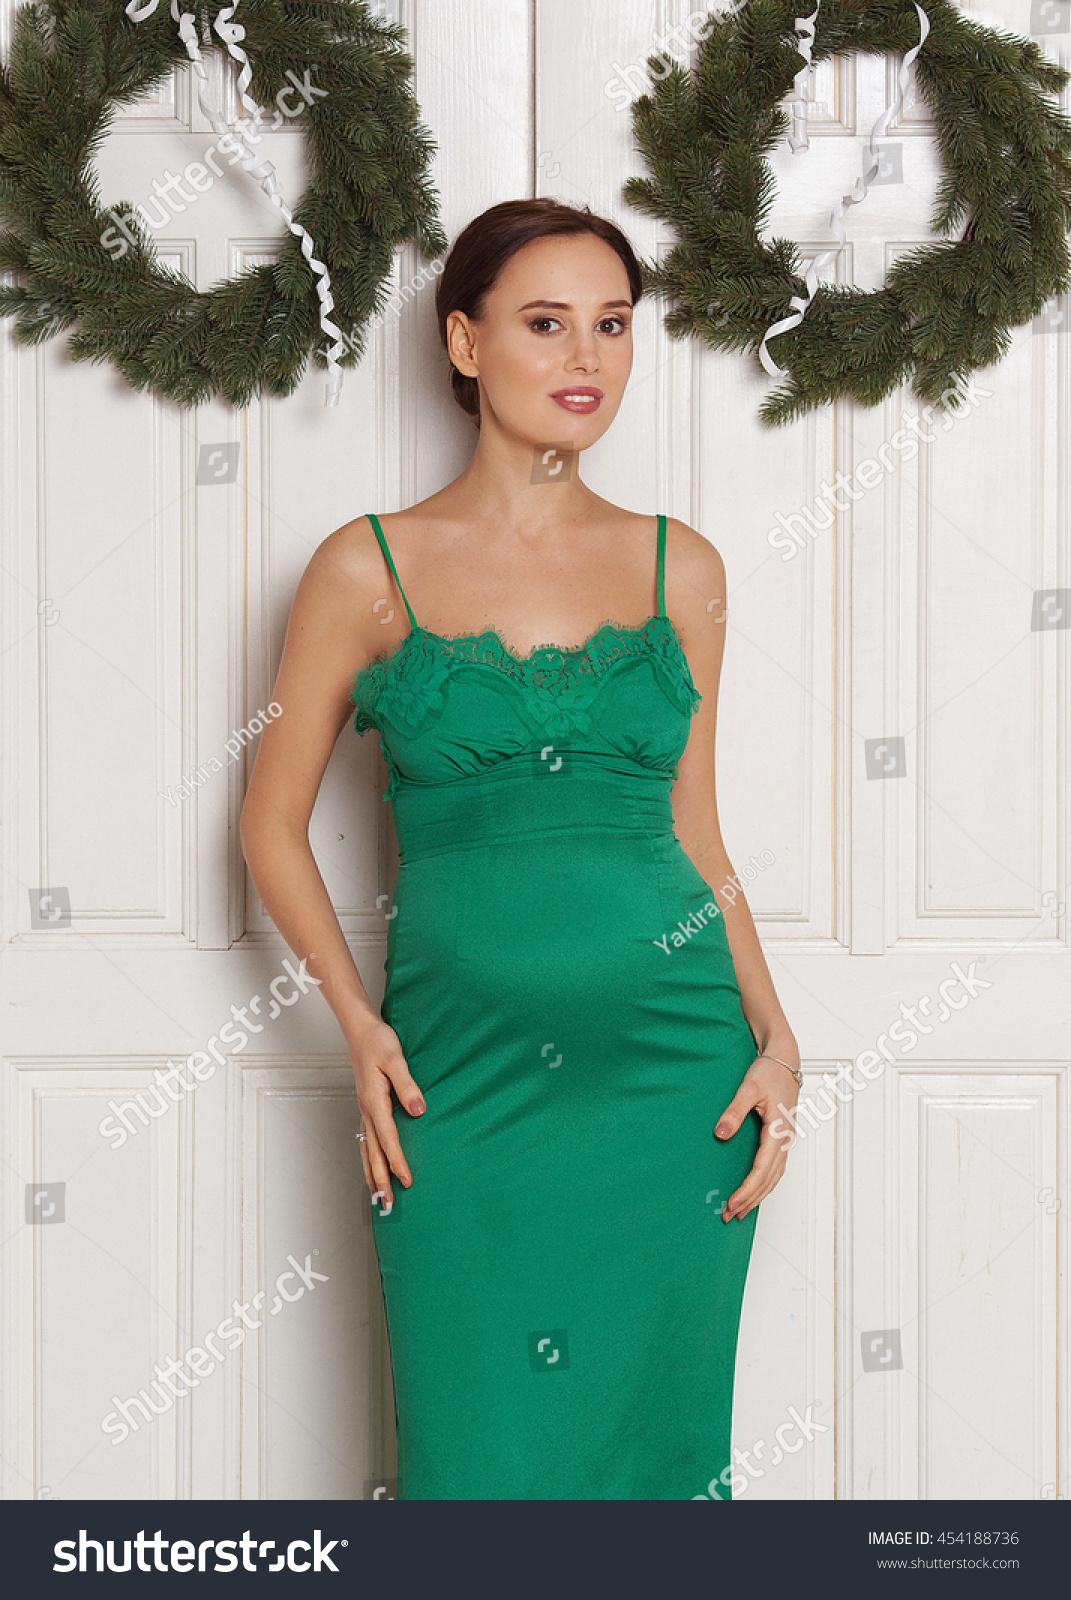 Portrait Beautiful Pregnant Woman Green Dress Stock Photo (Royalty ...